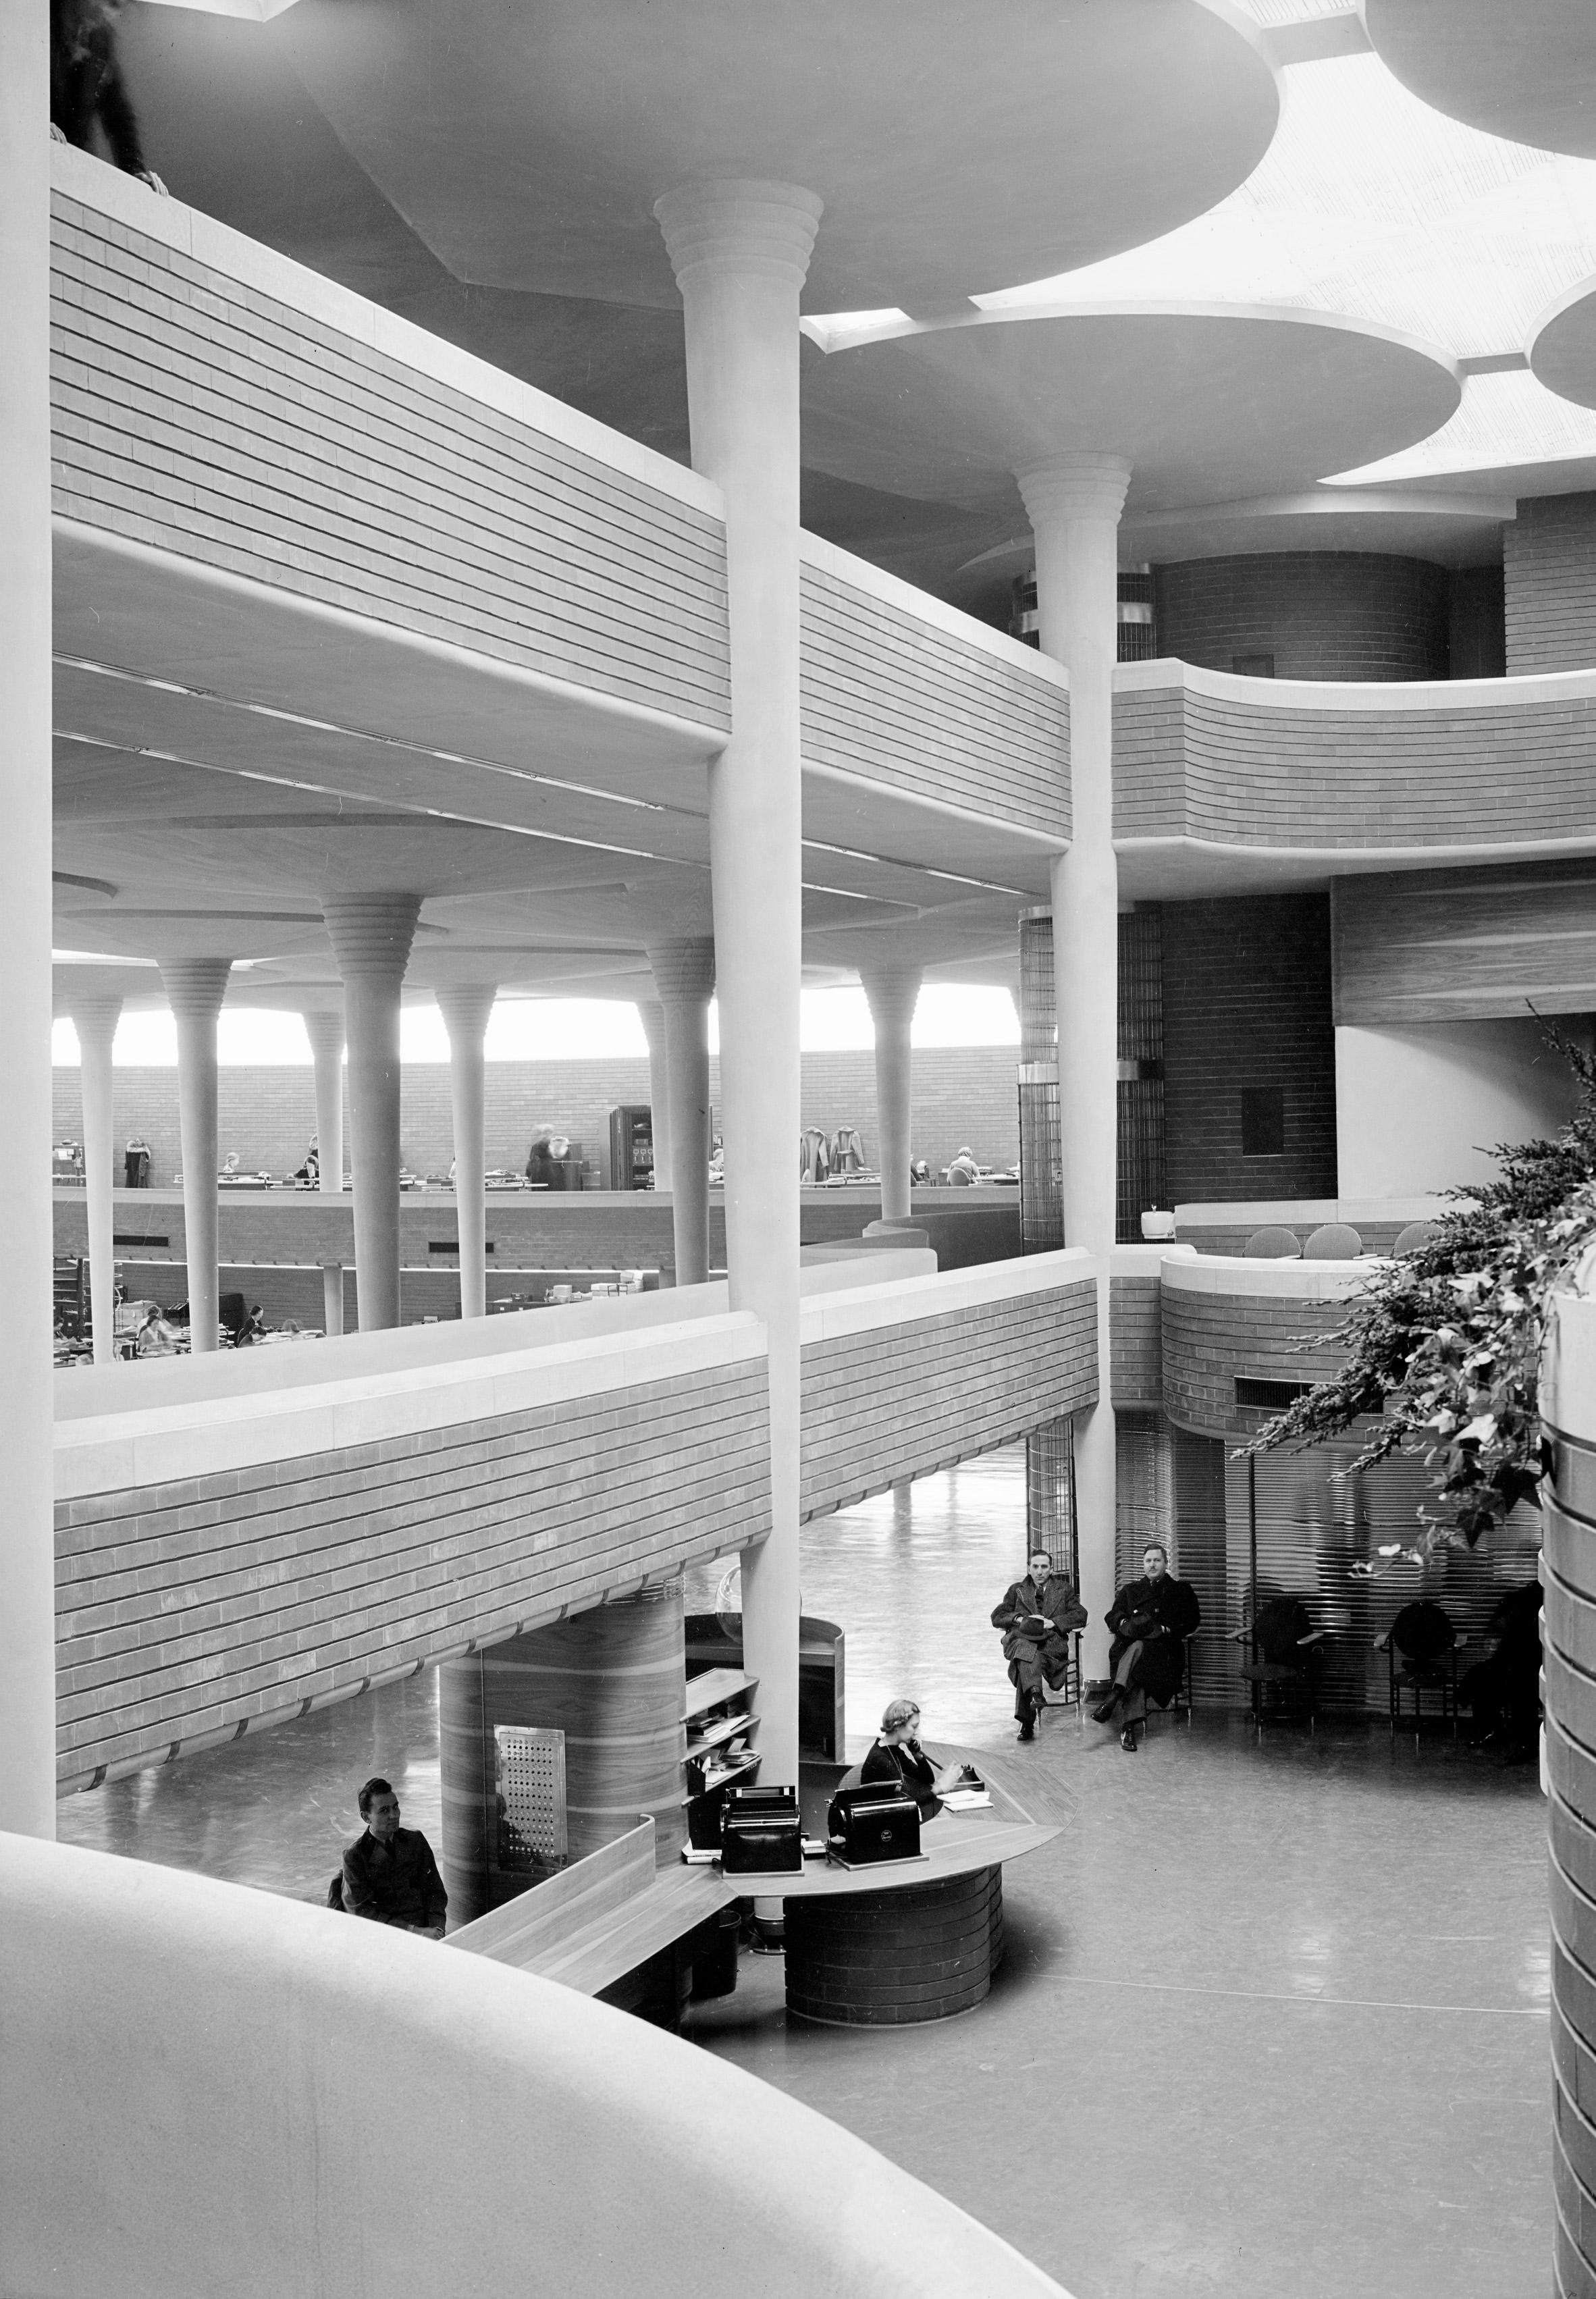 SC Johnson Administration Building, Frank Lloyd Wright